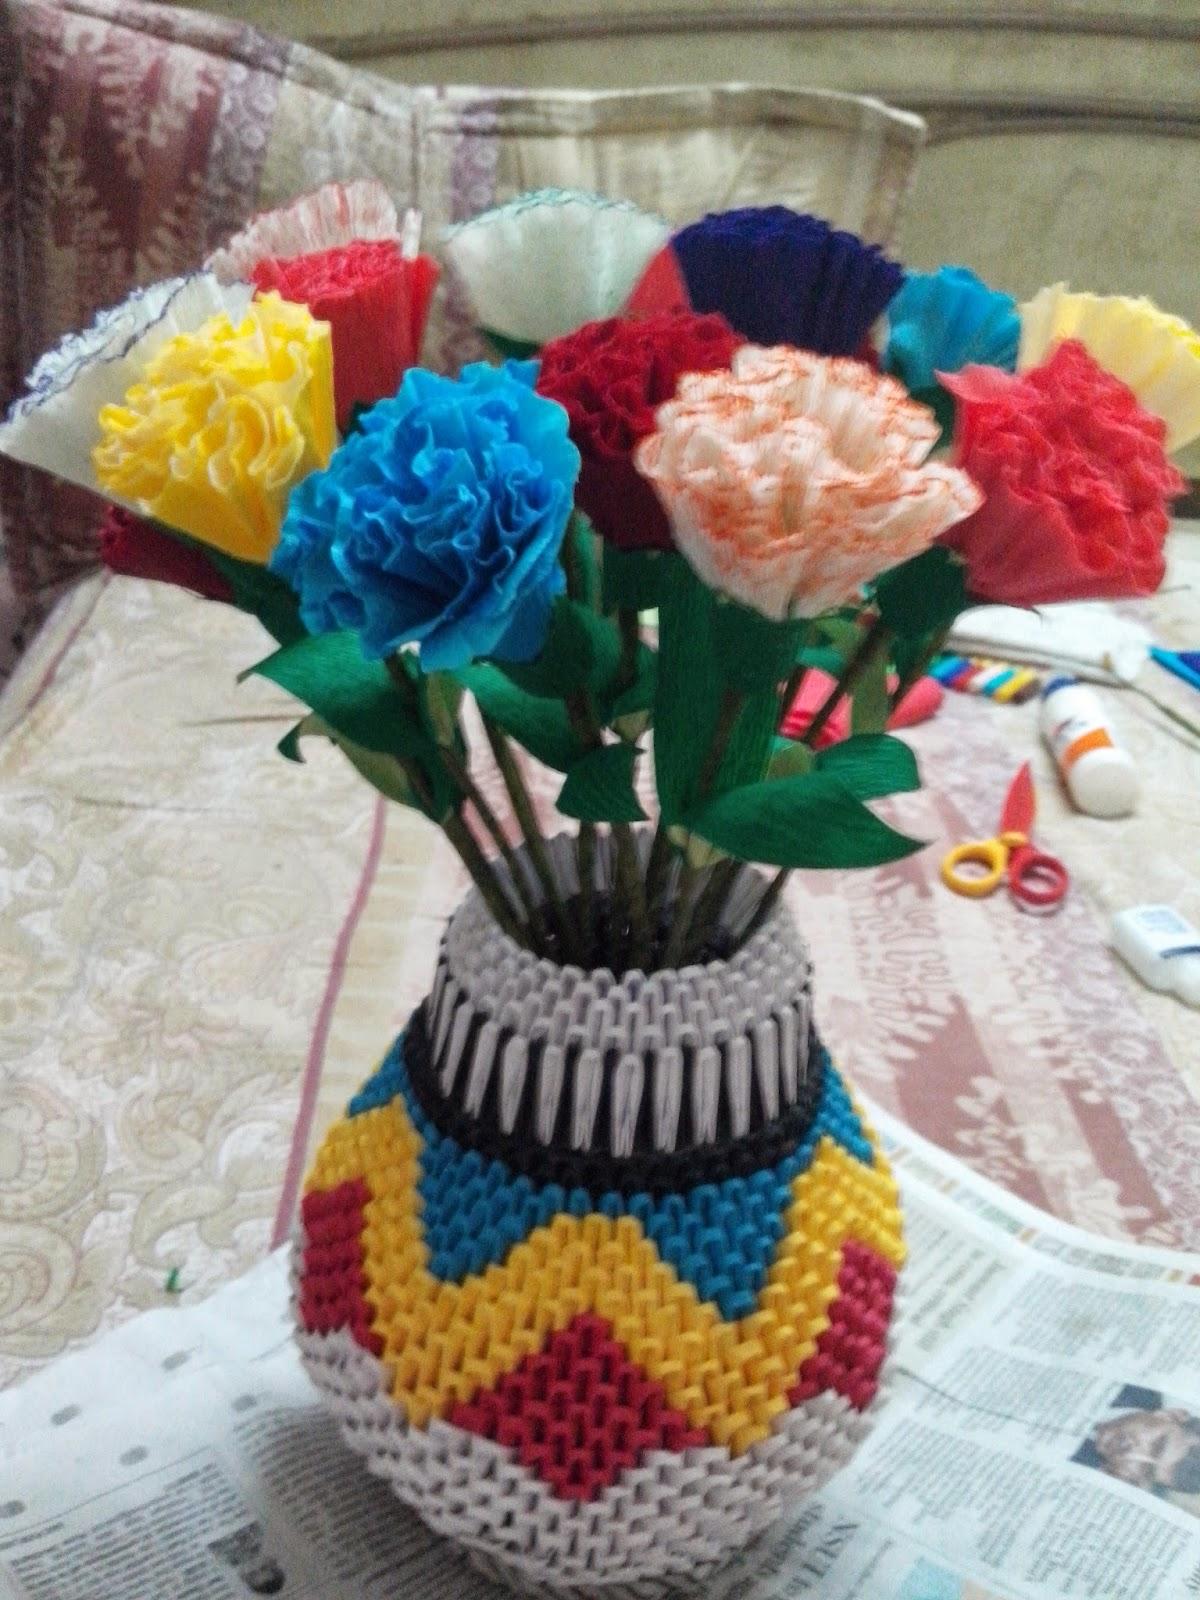 Papercraft 3D Origami Tall Flower Vase   PapercraftSquare.com   1600x1200